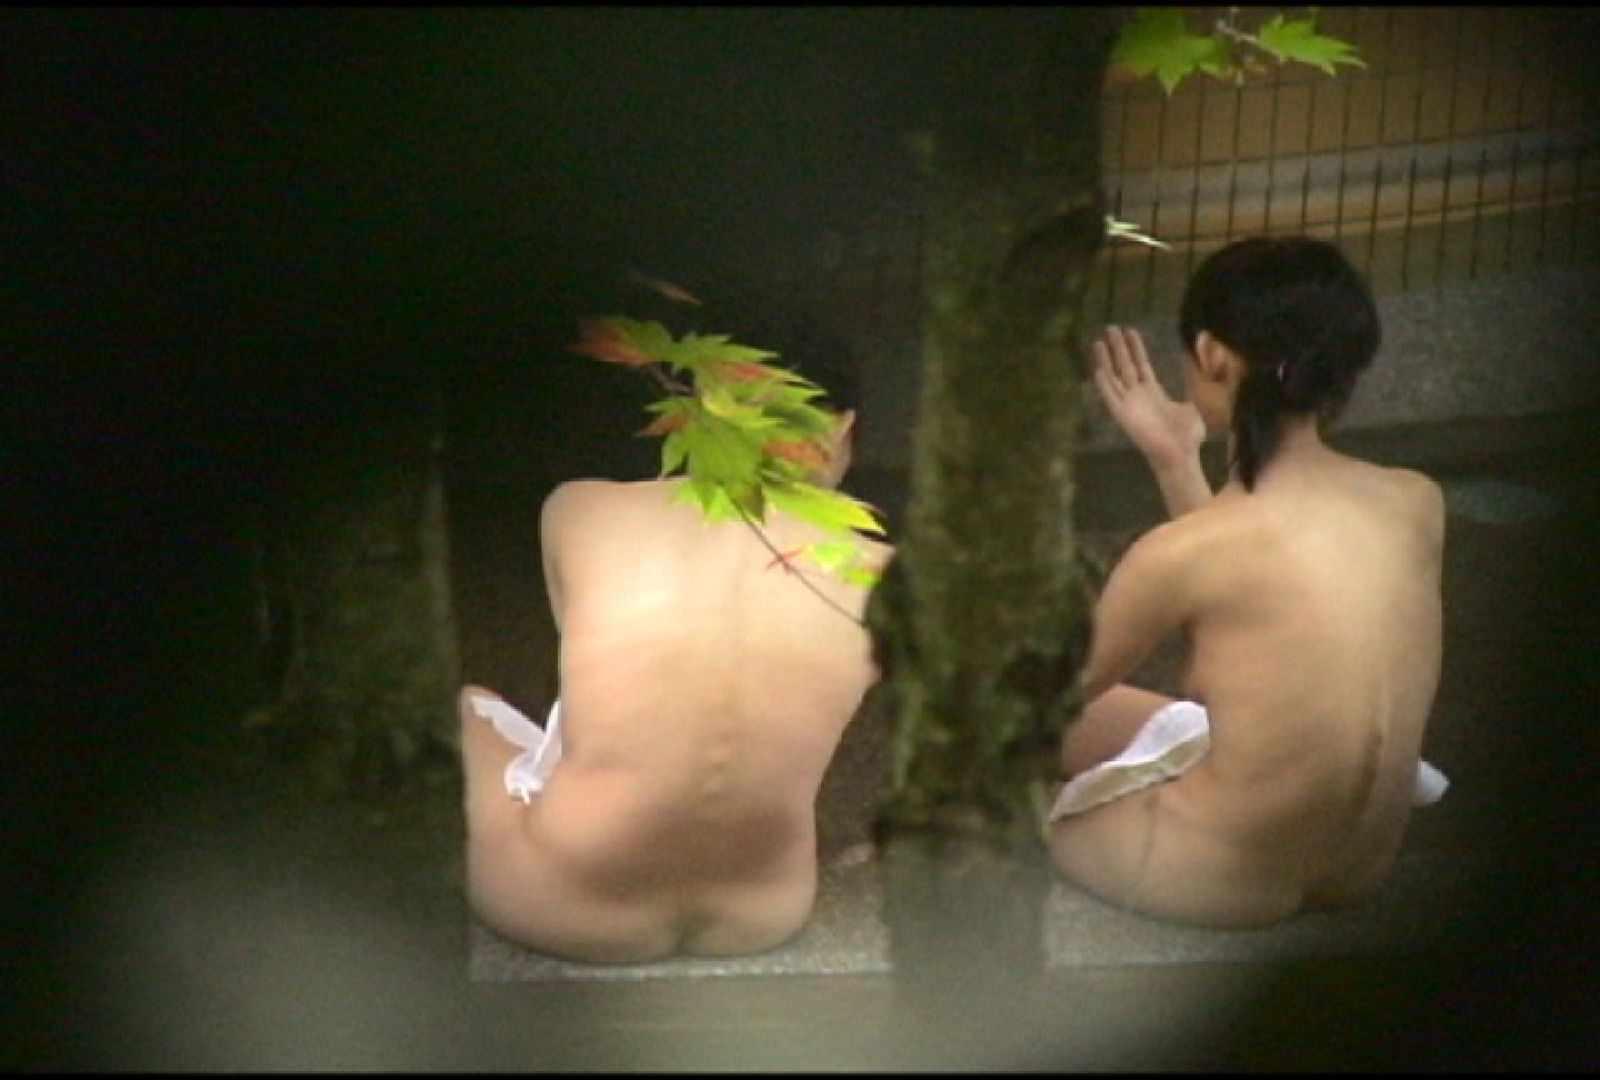 No.2 地味な2人、共に理想的な胸ですよ・・・しかし地味だ 美女達のヌード | 露天風呂の女達  67連発 47